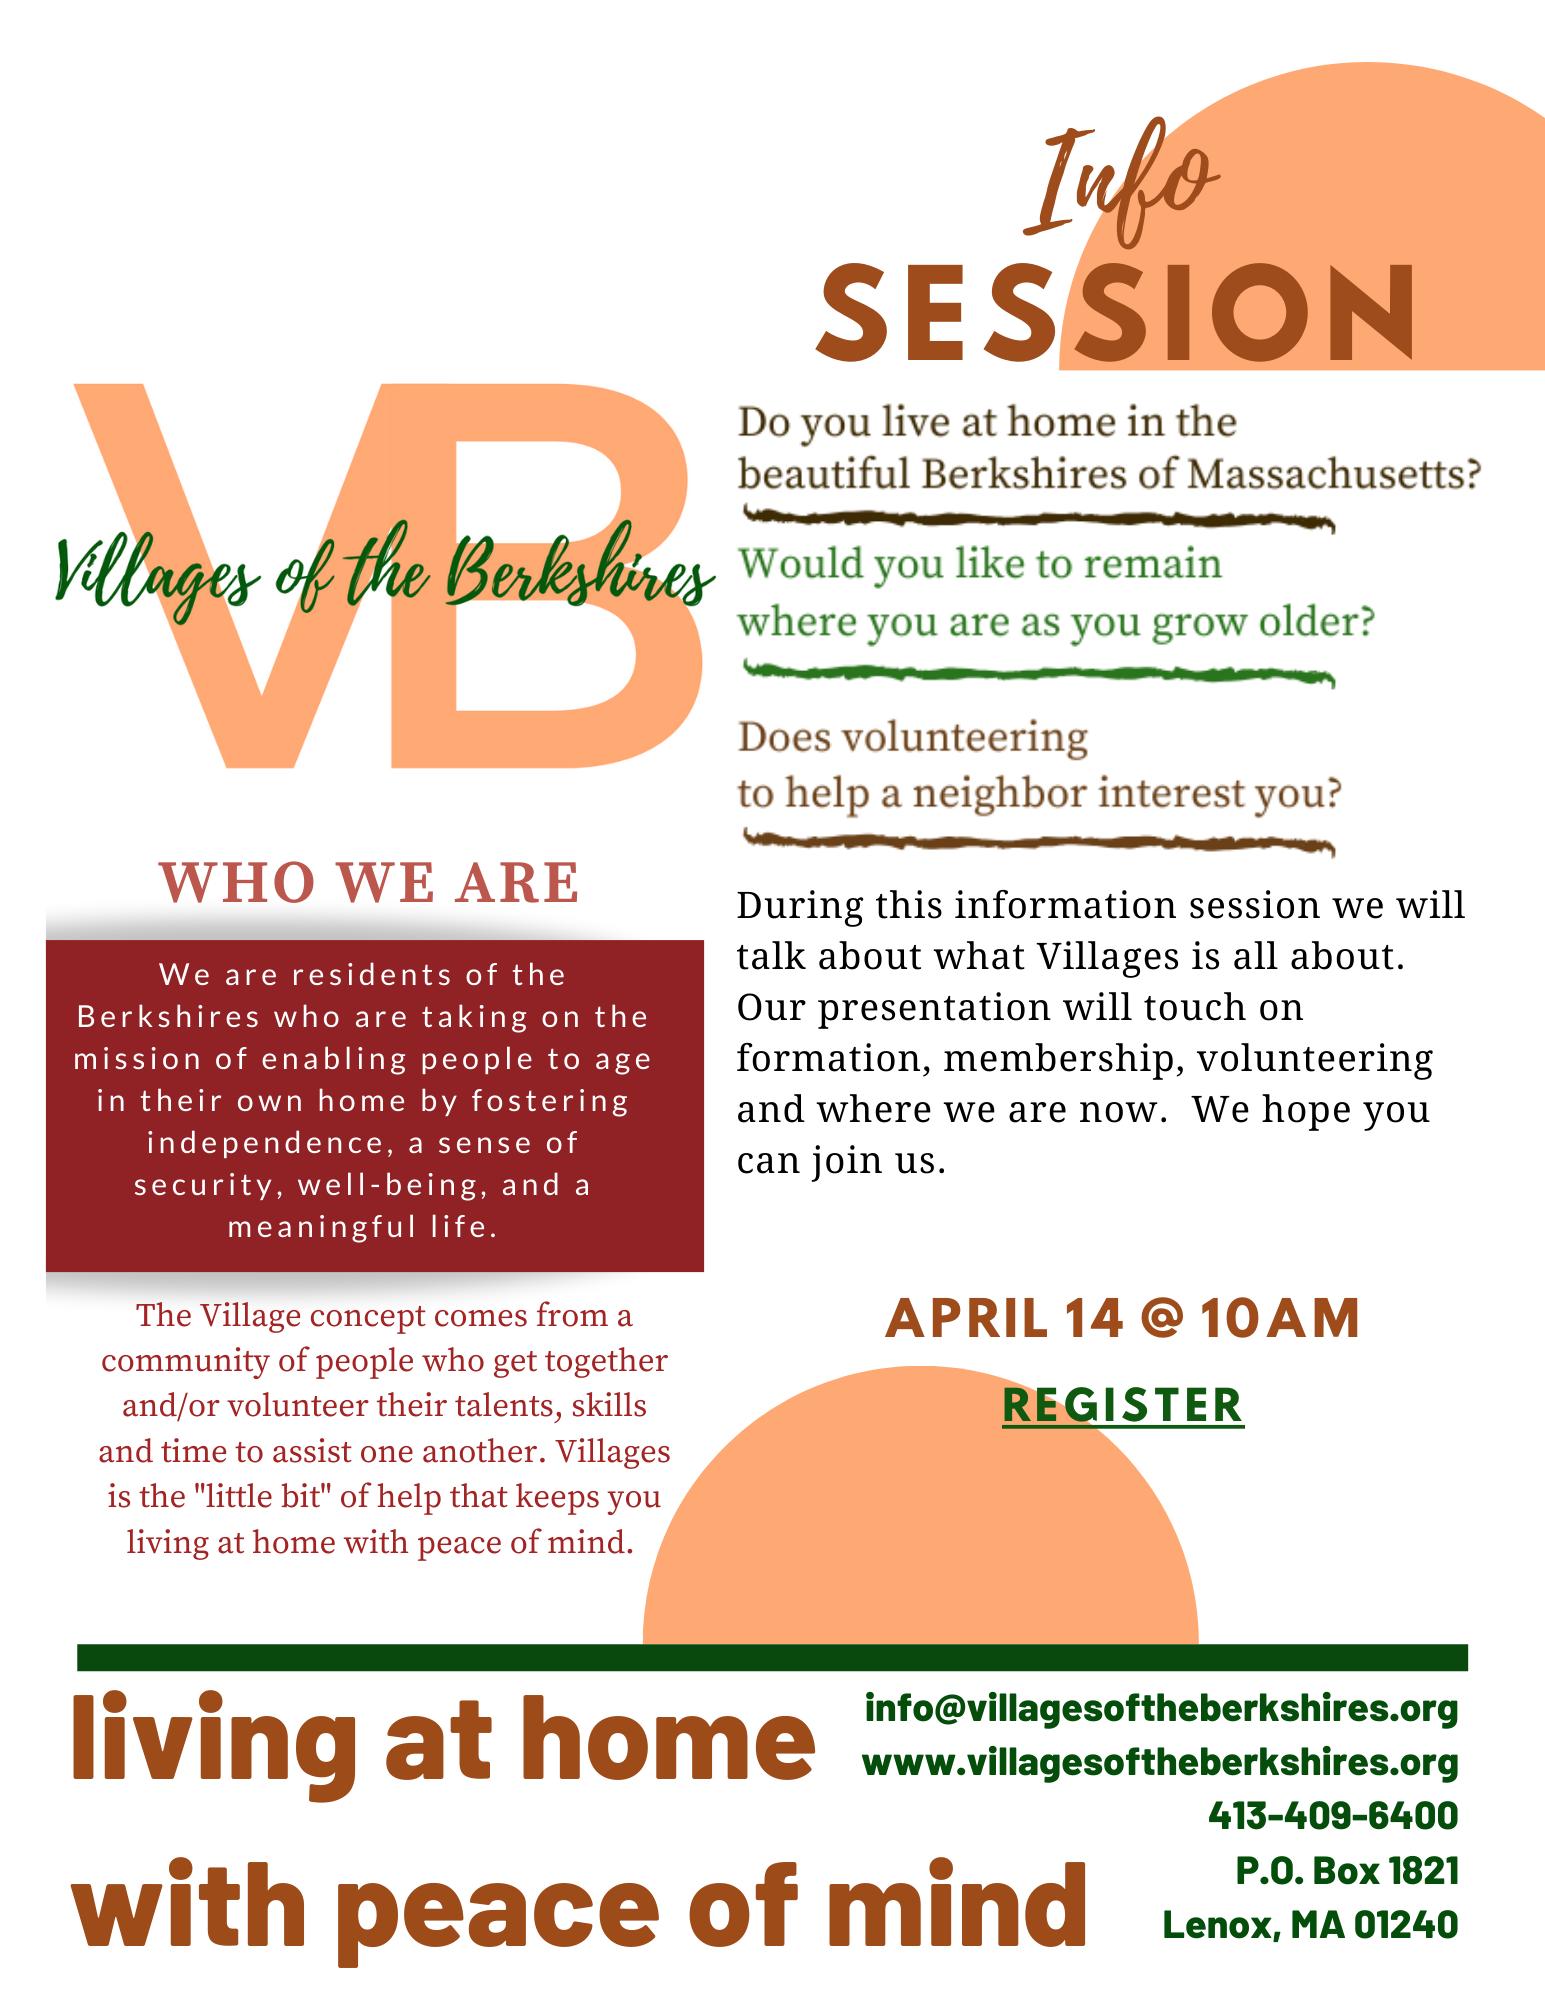 Villages of the Berkshires, Inc.  General Information Session